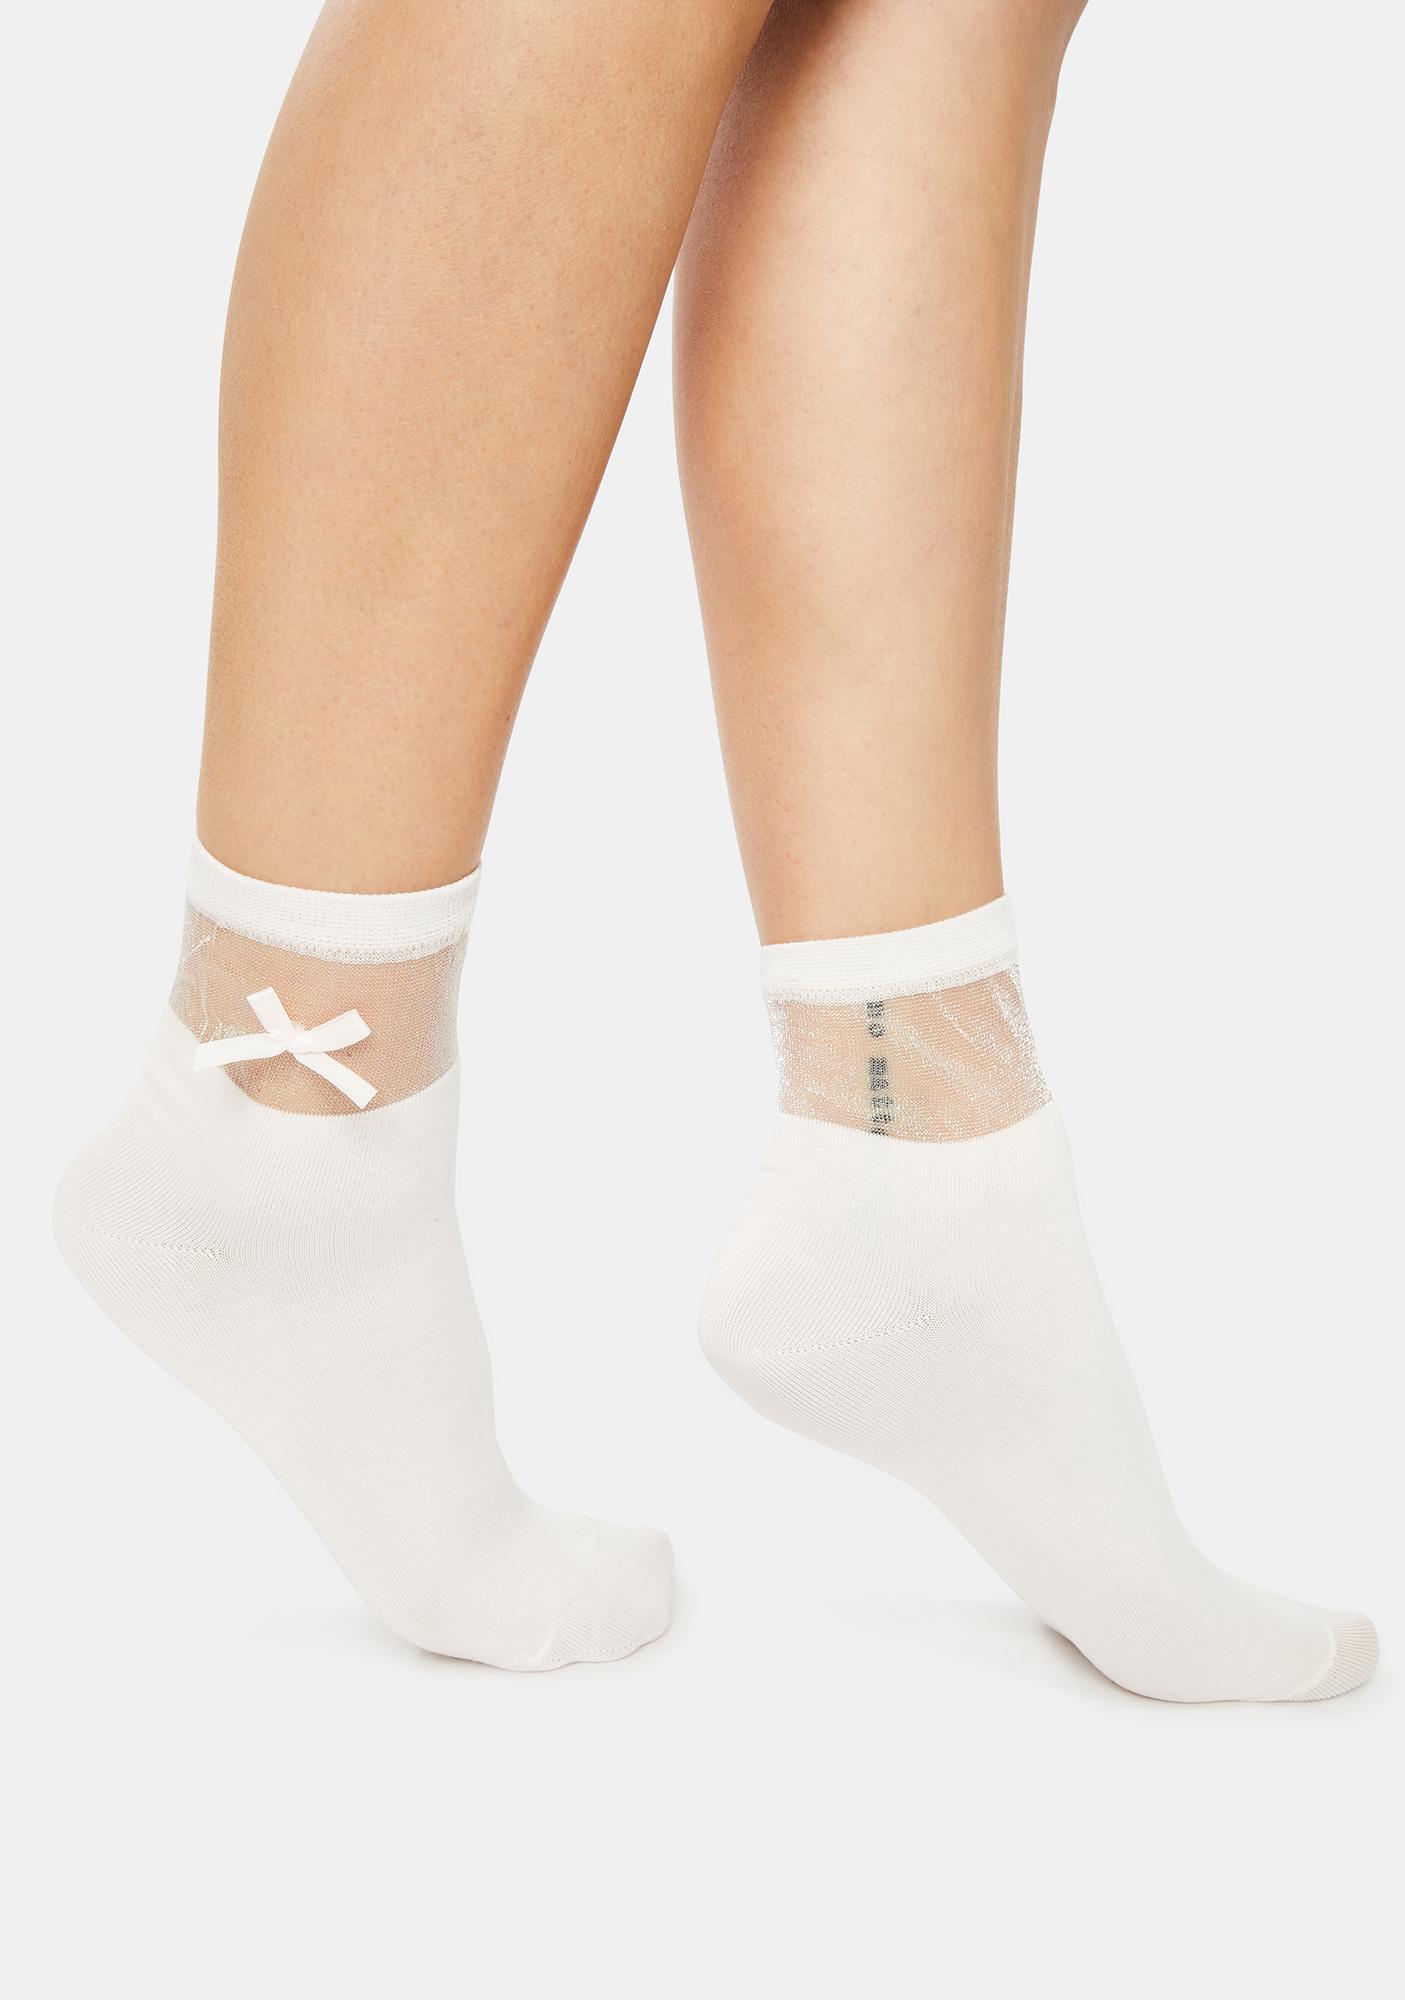 Cutie Confessions Bow Socks